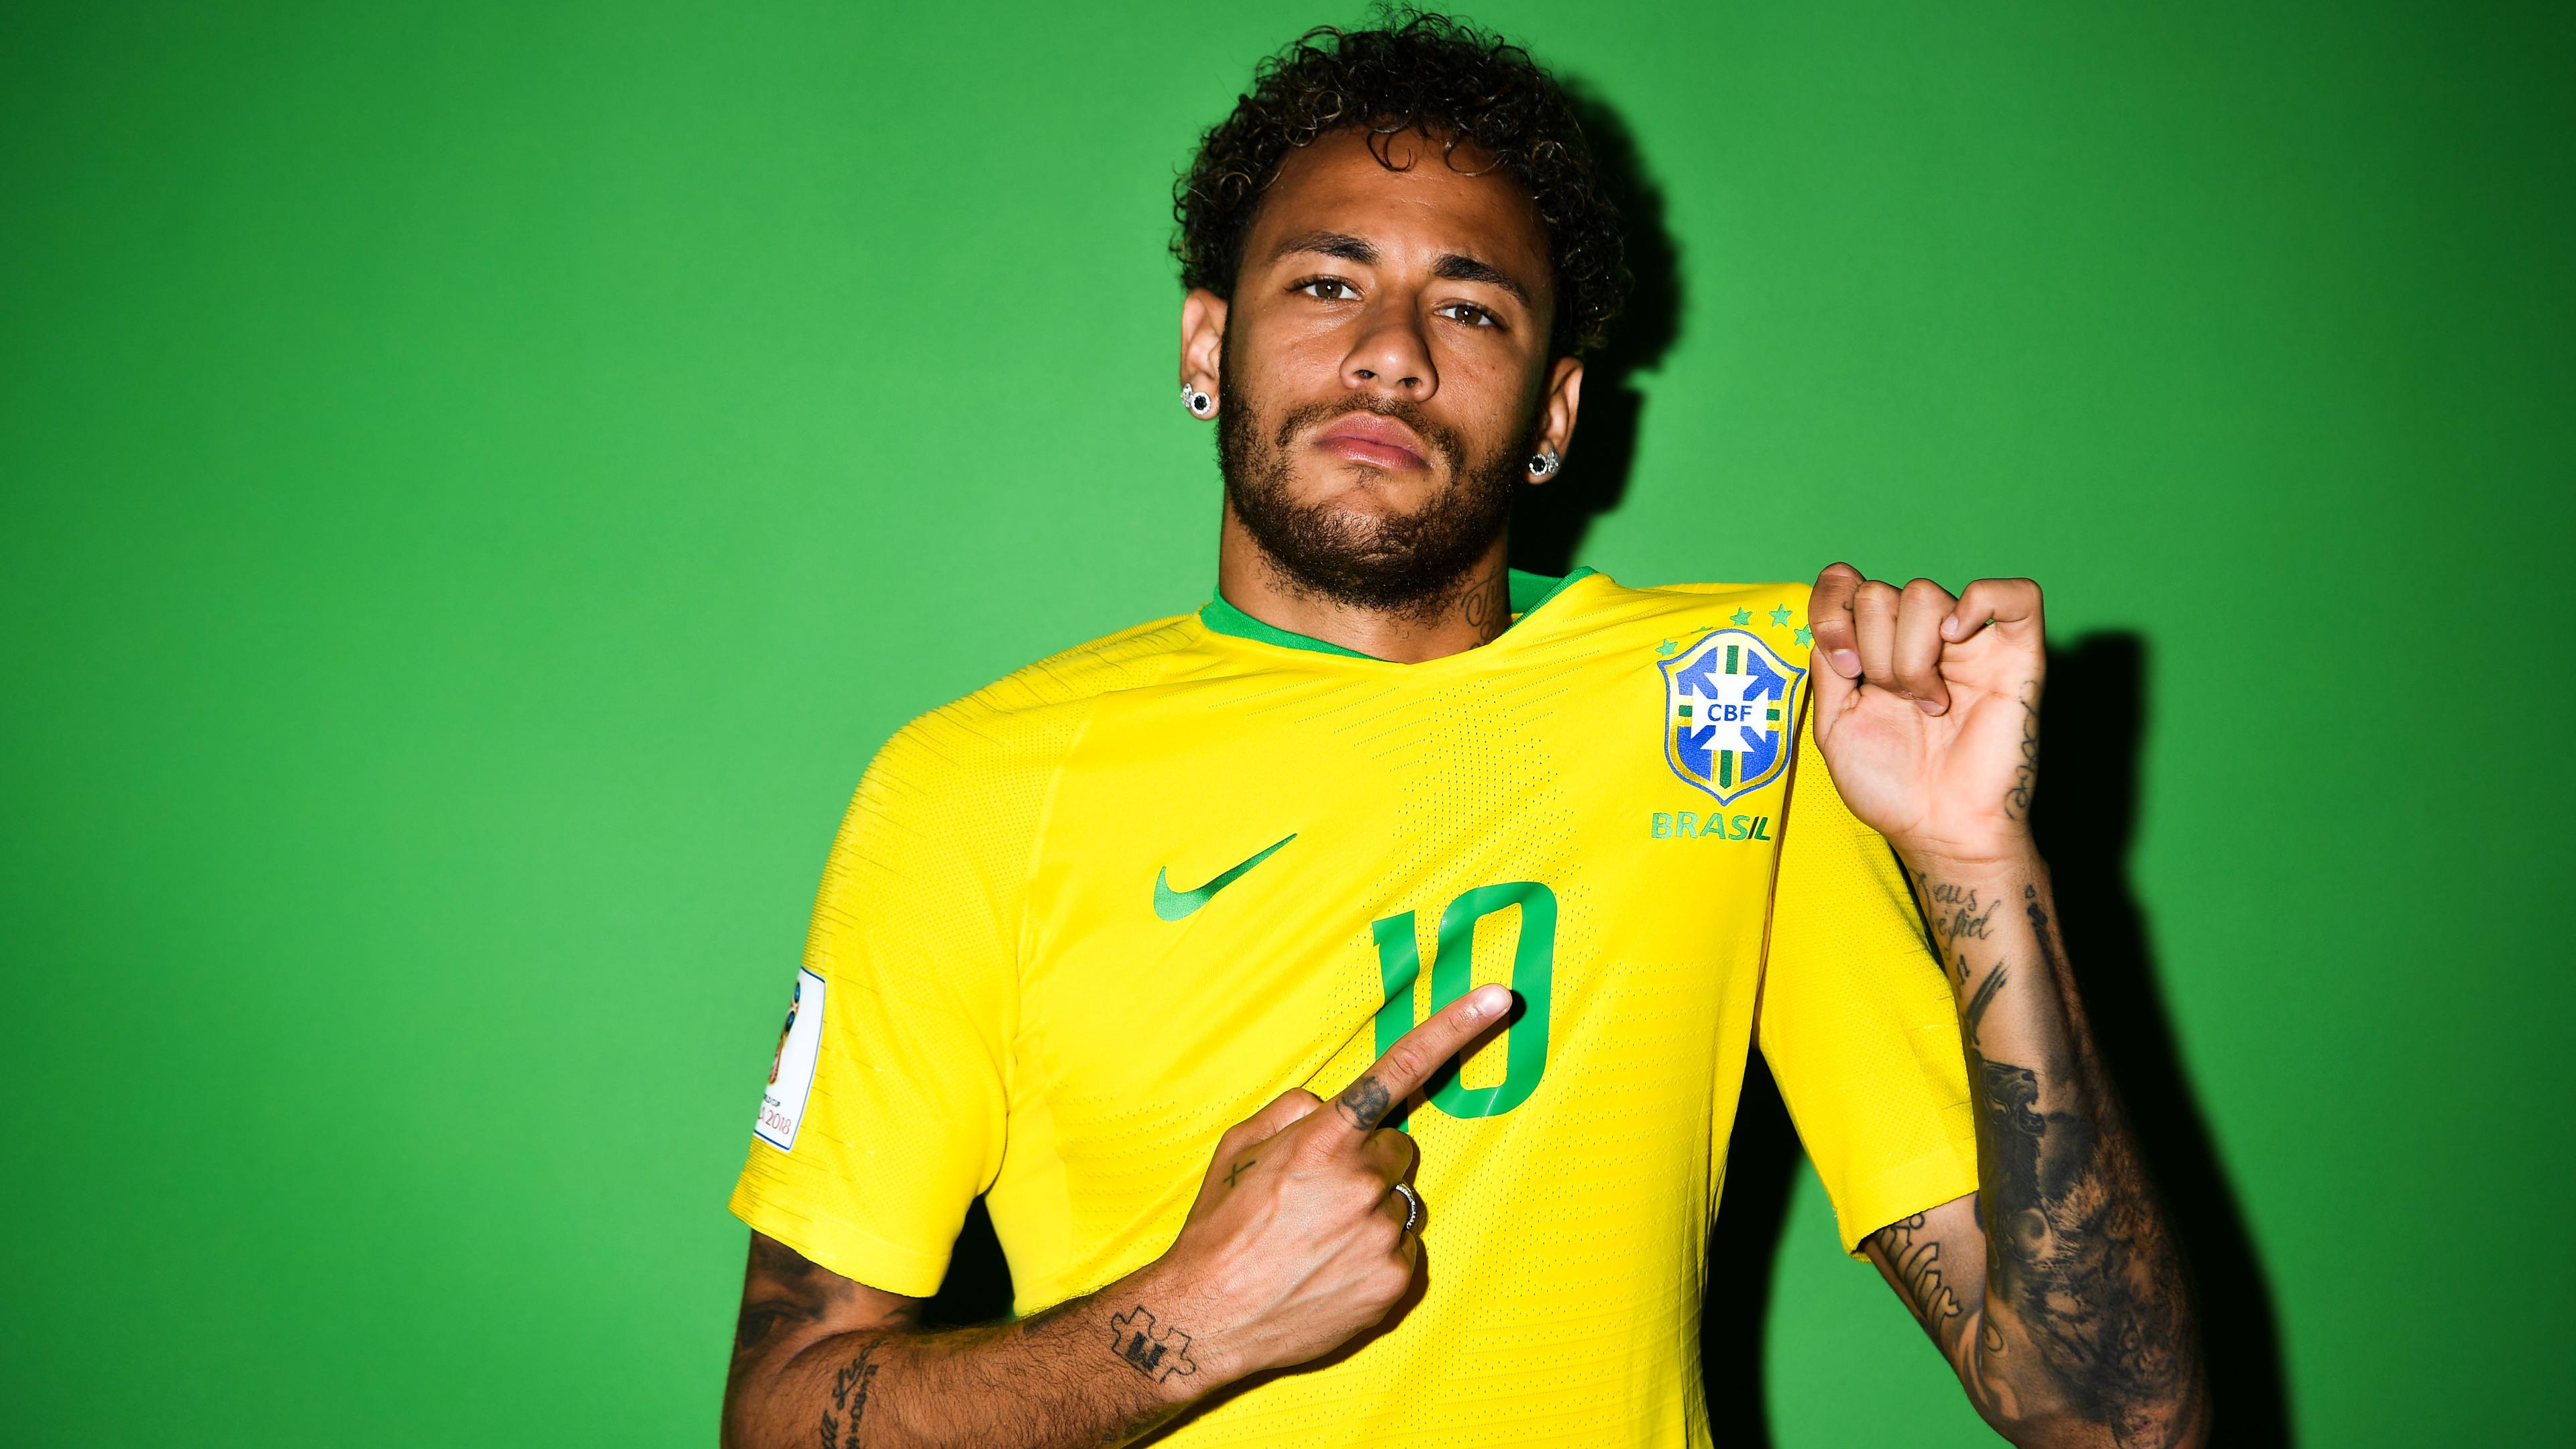 neymar jr brazil portraits 1538786894 - Neymar Jr Brazil Portraits - sports wallpapers, neymar wallpapers, neymar jr wallpapers, male celebrities wallpapers, hd-wallpapers, football wallpapers, fifa world cup russia wallpapers, boys wallpapers, 5k wallpapers, 4k-wallpapers